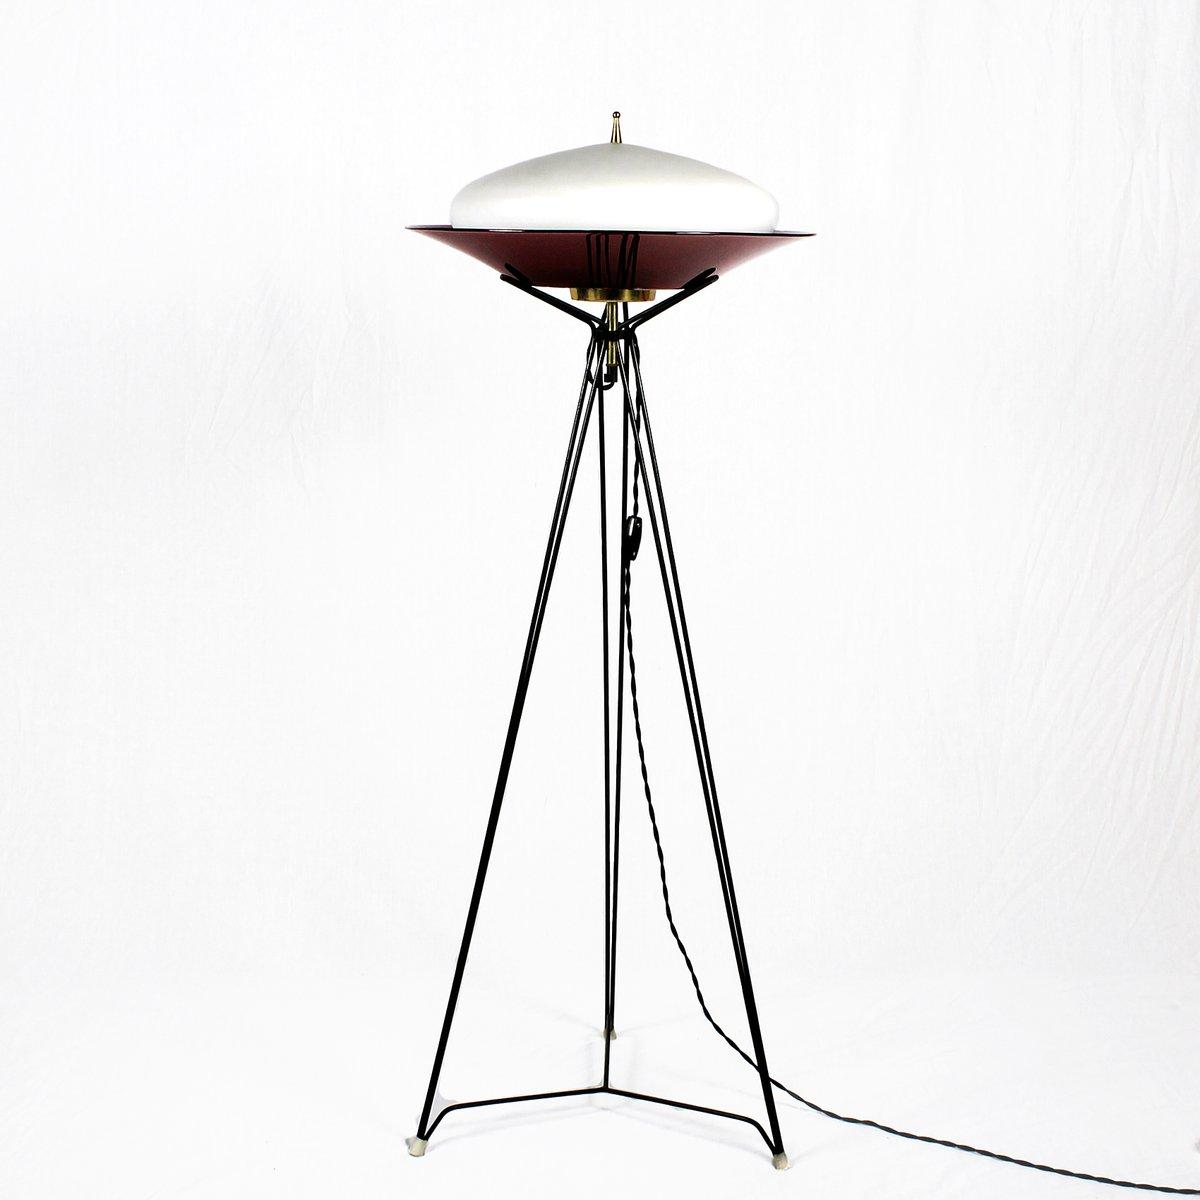 Italian Tripod Floor Lamp 1960s For Sale At Pamono